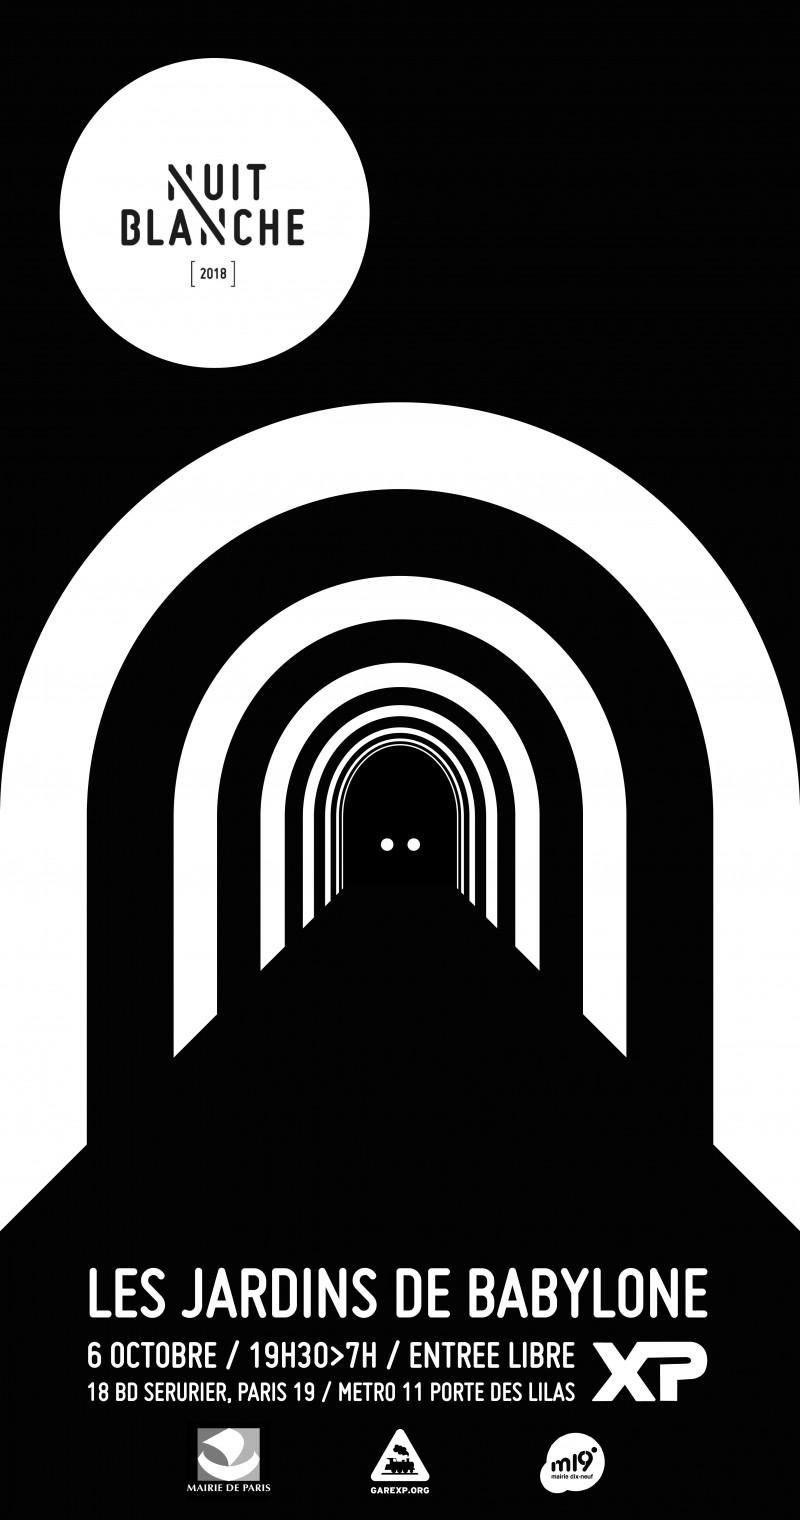 affiche-nuit-blanche-2018-gare-xp-f0d0c811ed19da0fd81671380f8223c2